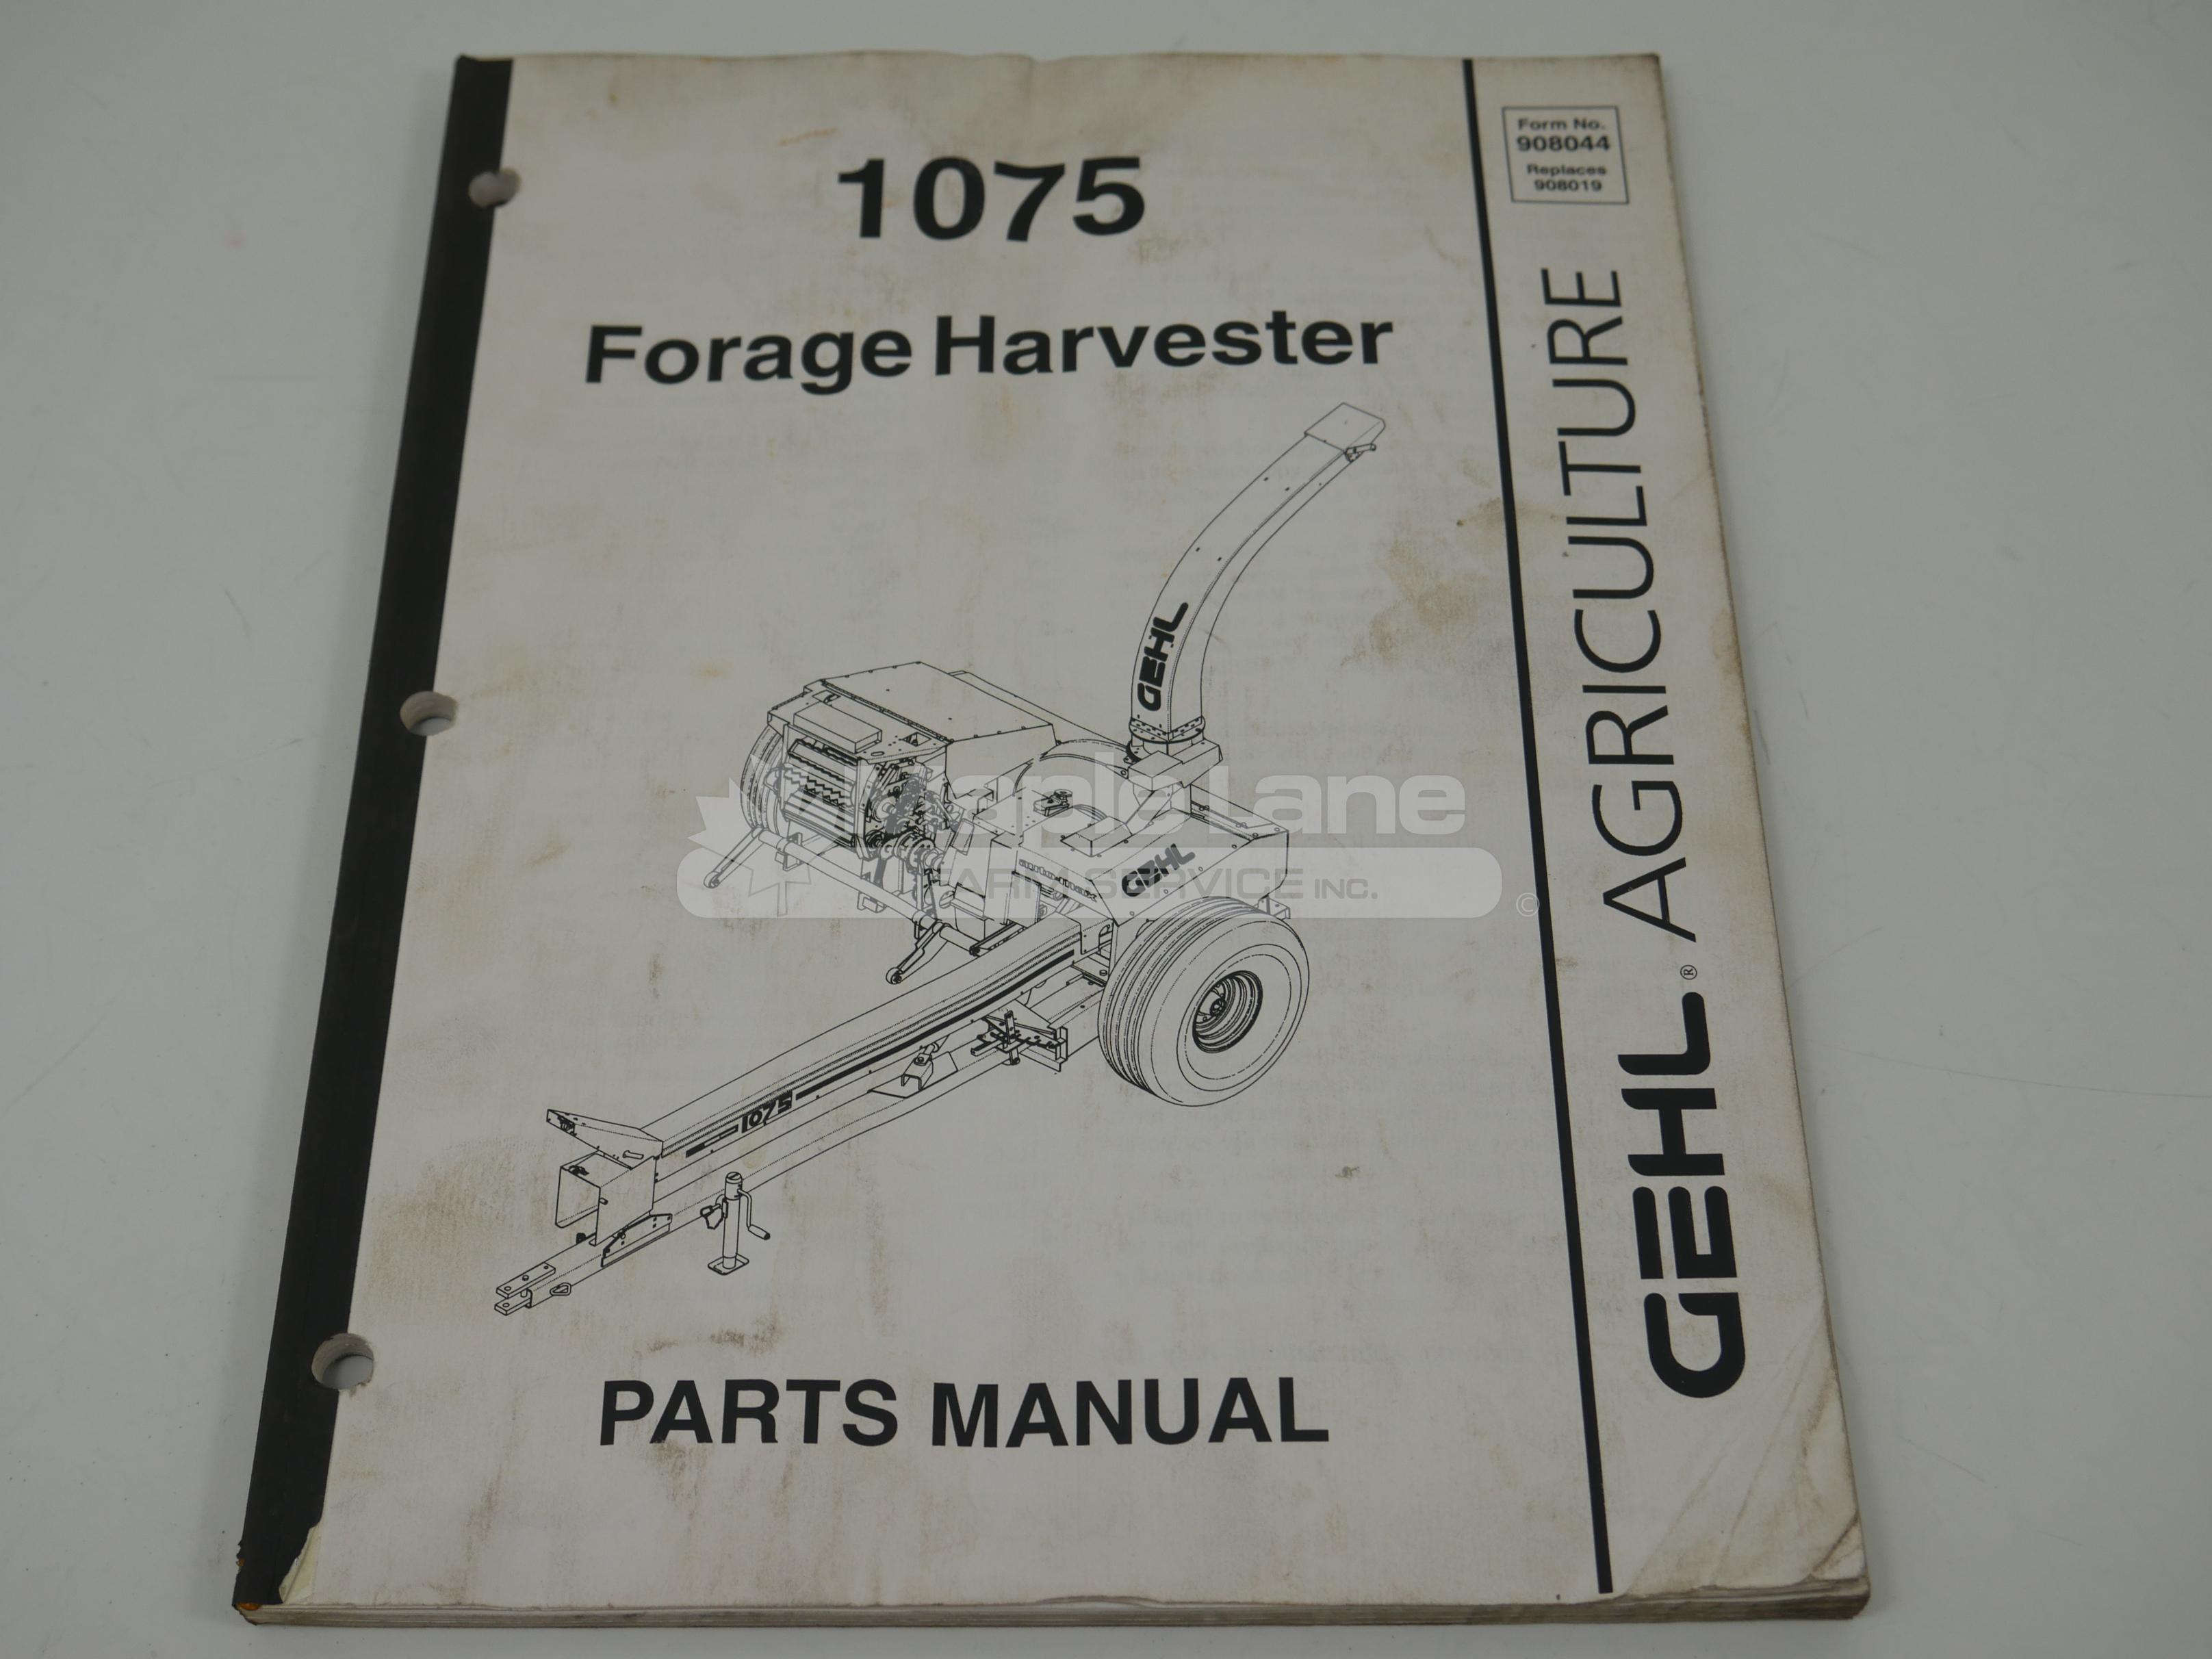 908044 Parts Manual